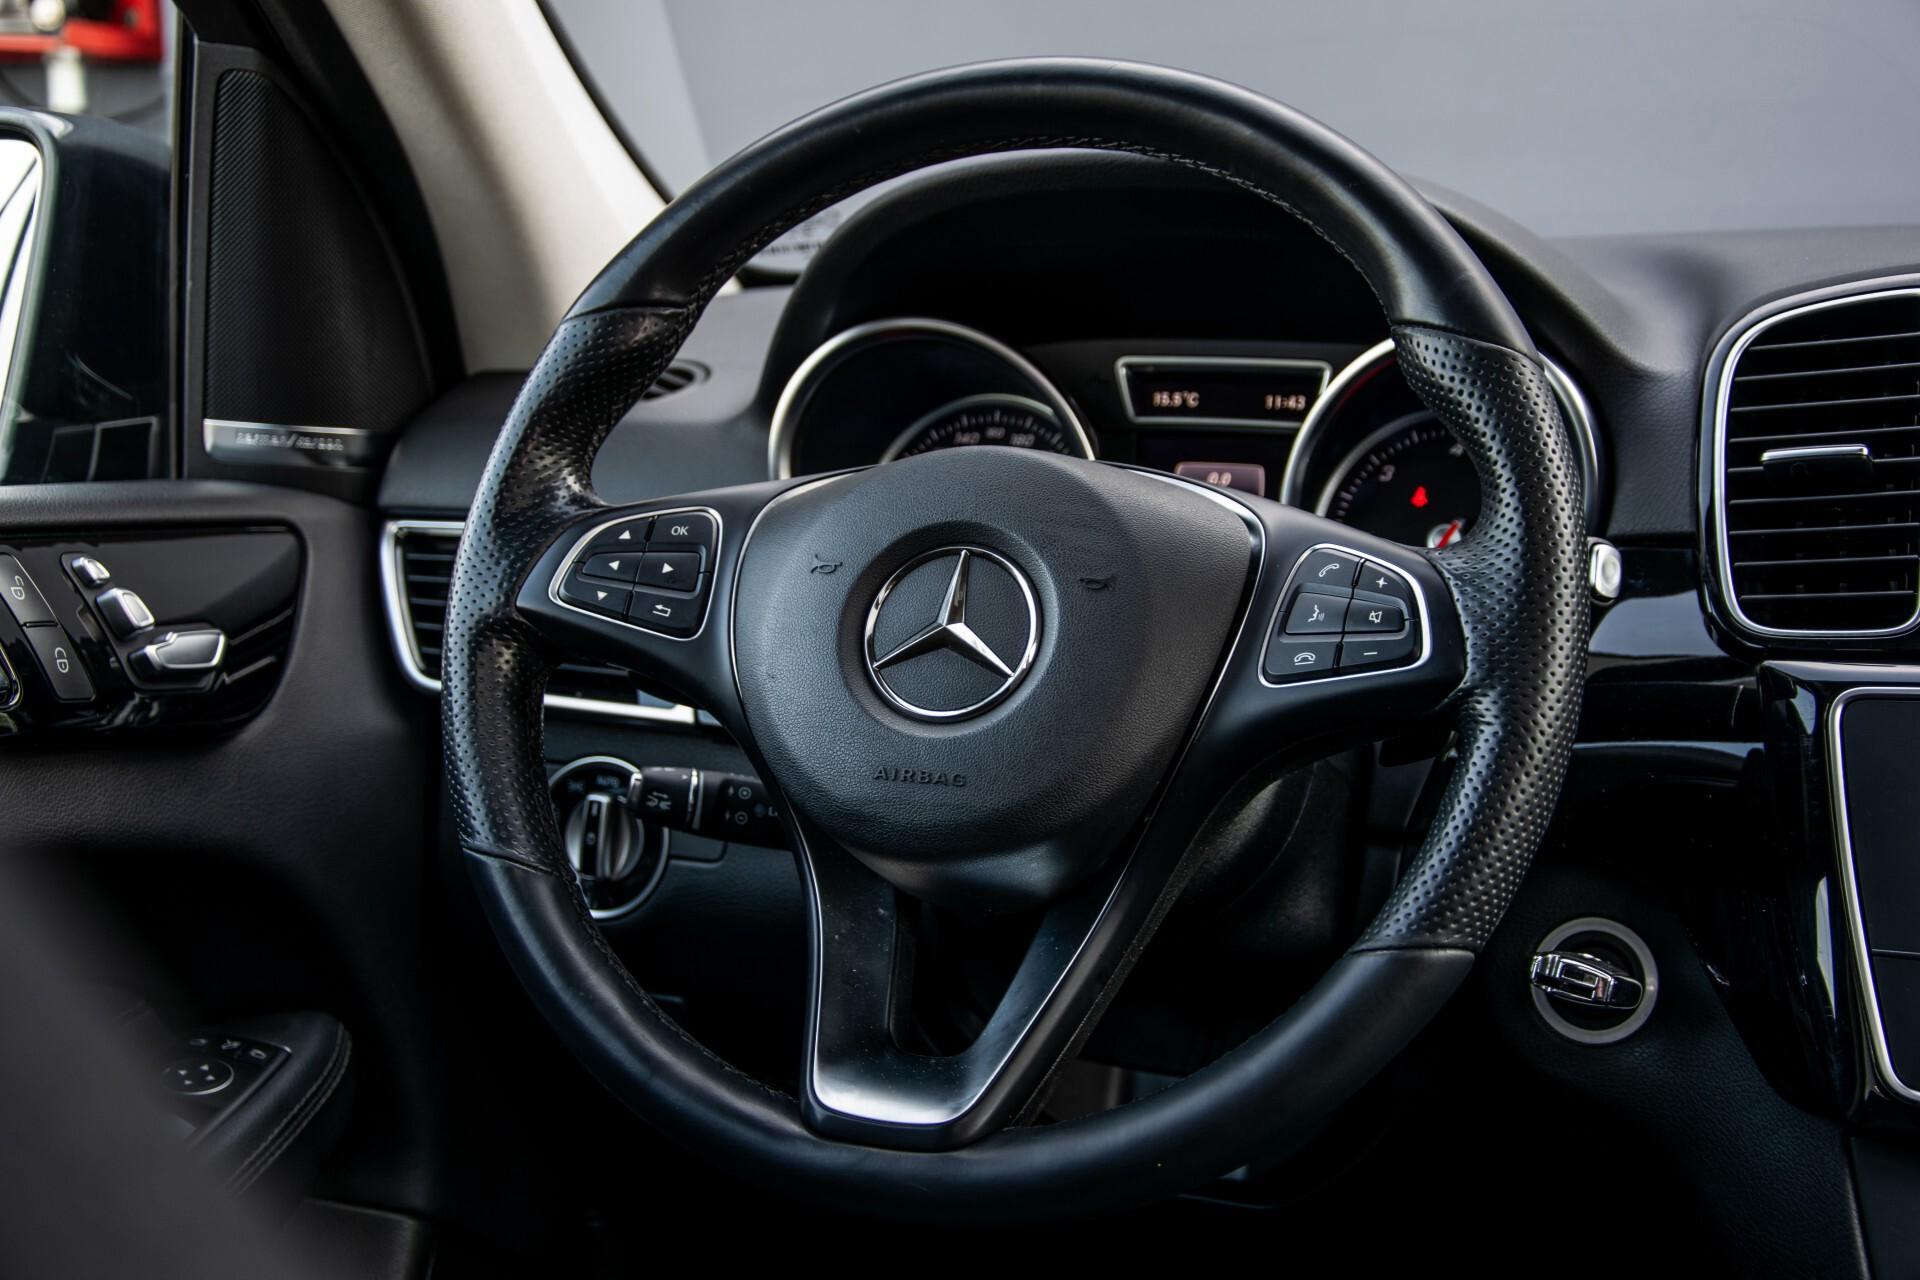 Mercedes-Benz GLE 350 d 4-M AMG Active Curve System/Panorama/Standkachel/Harman-Kardon/Trekhaak Aut9 Foto 7